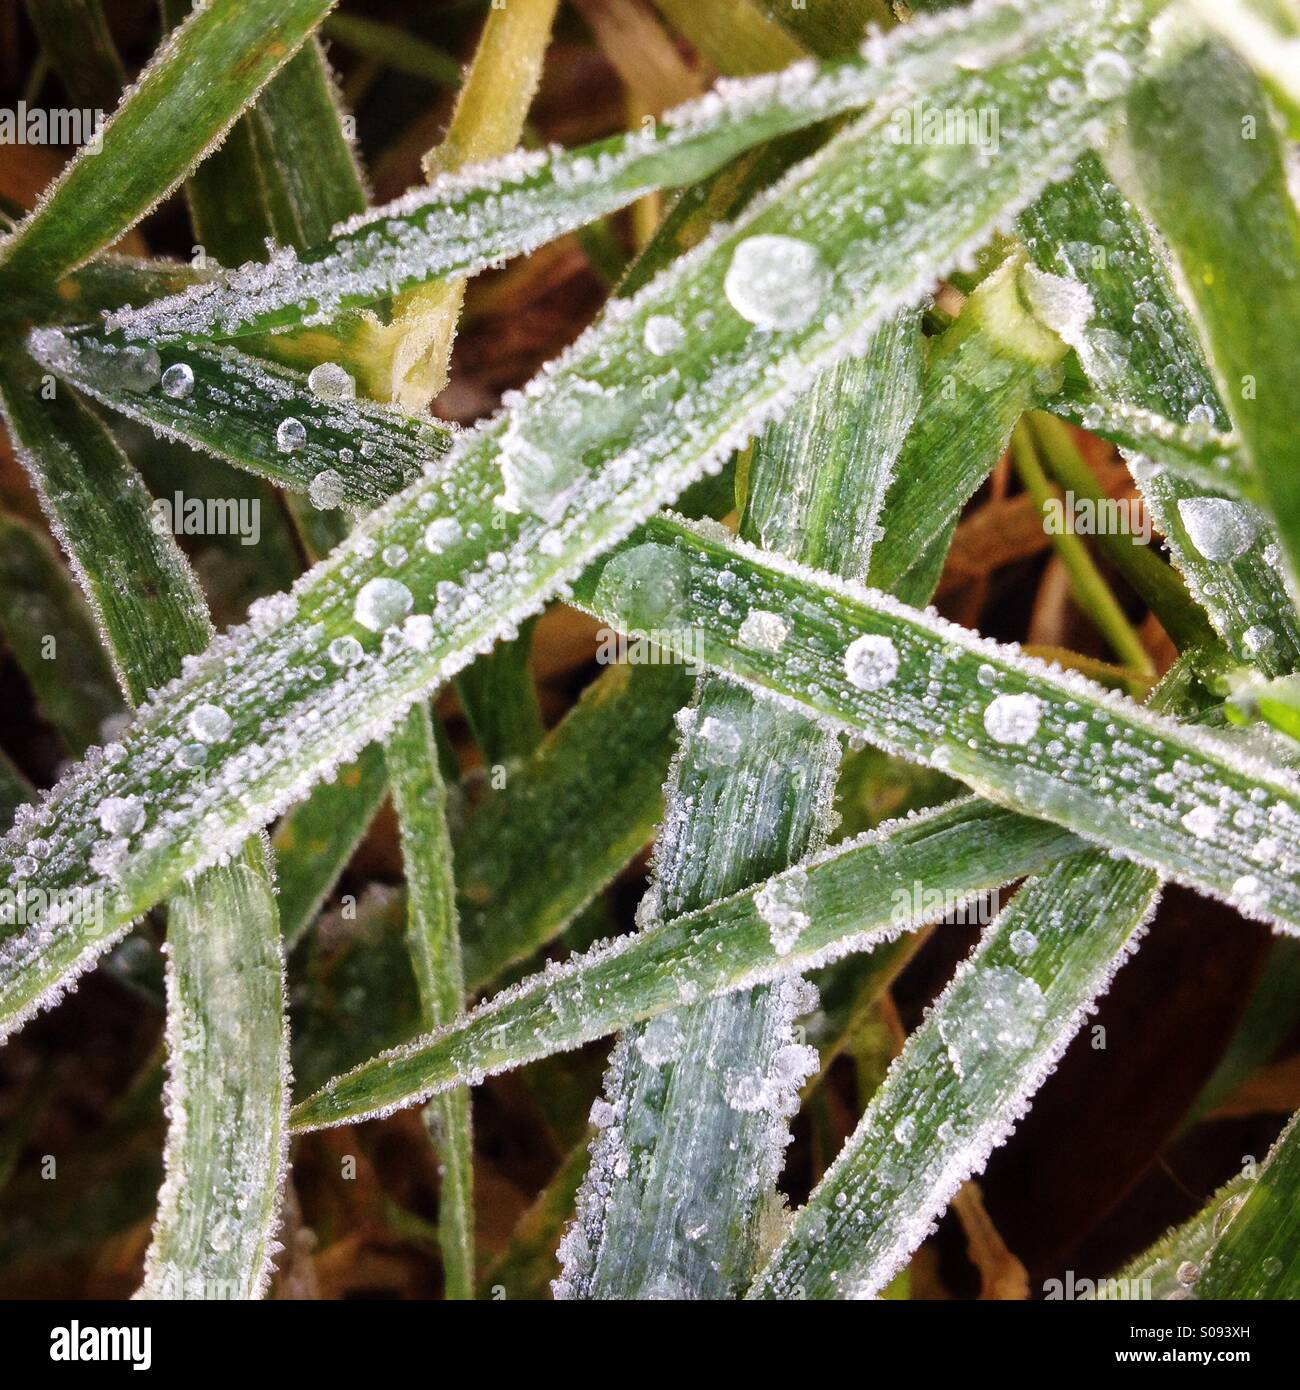 Close-up de hielo en láminas de césped Imagen De Stock